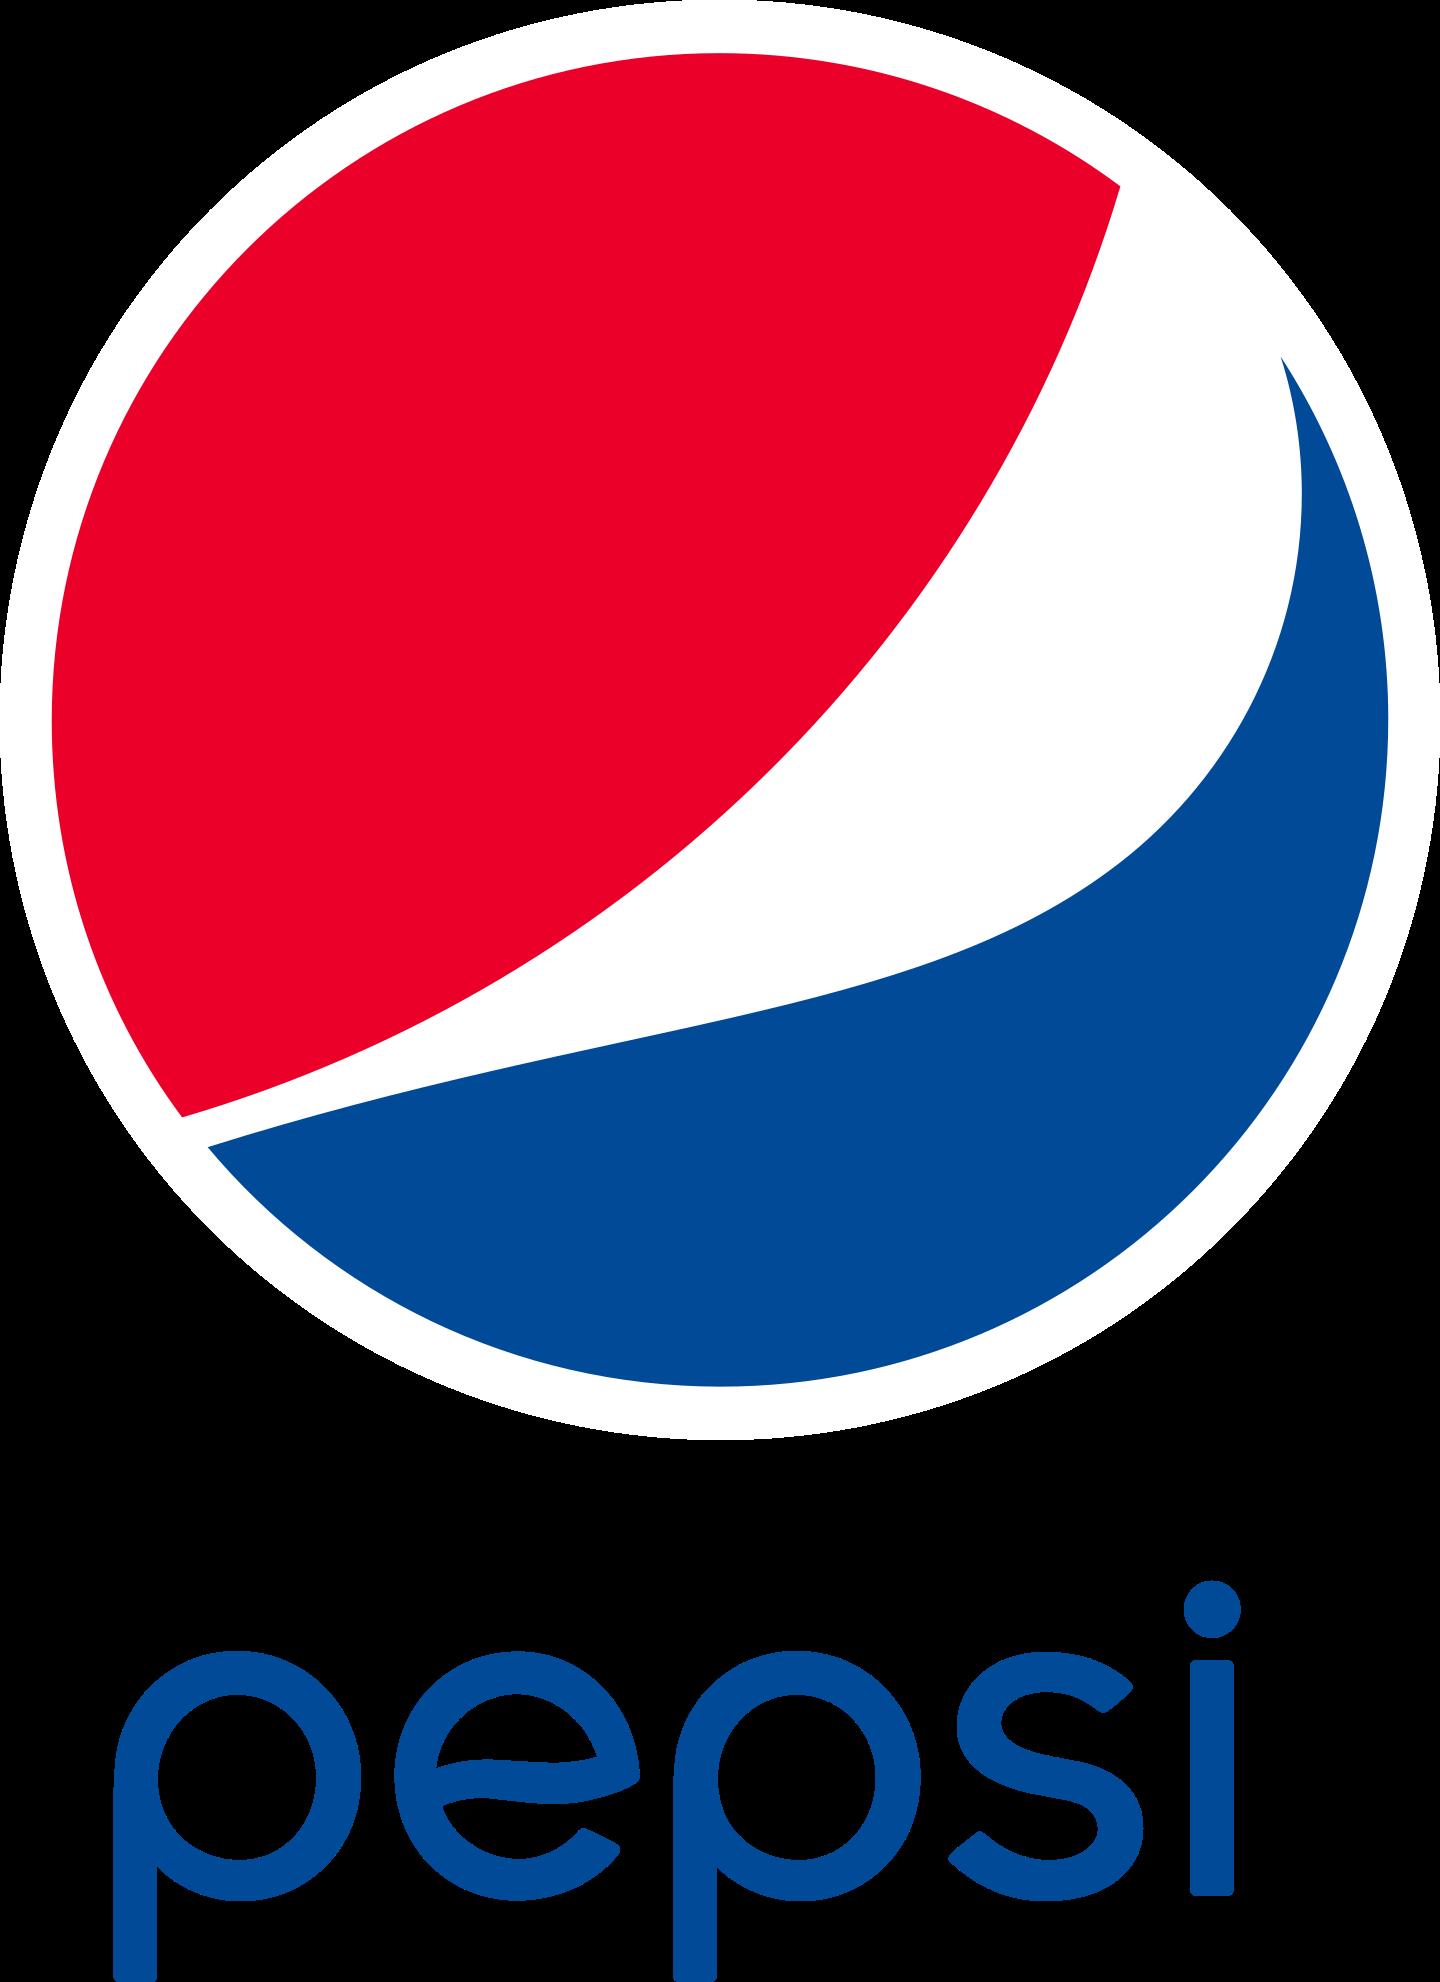 pepsi logo 3 - Pepsi Logo